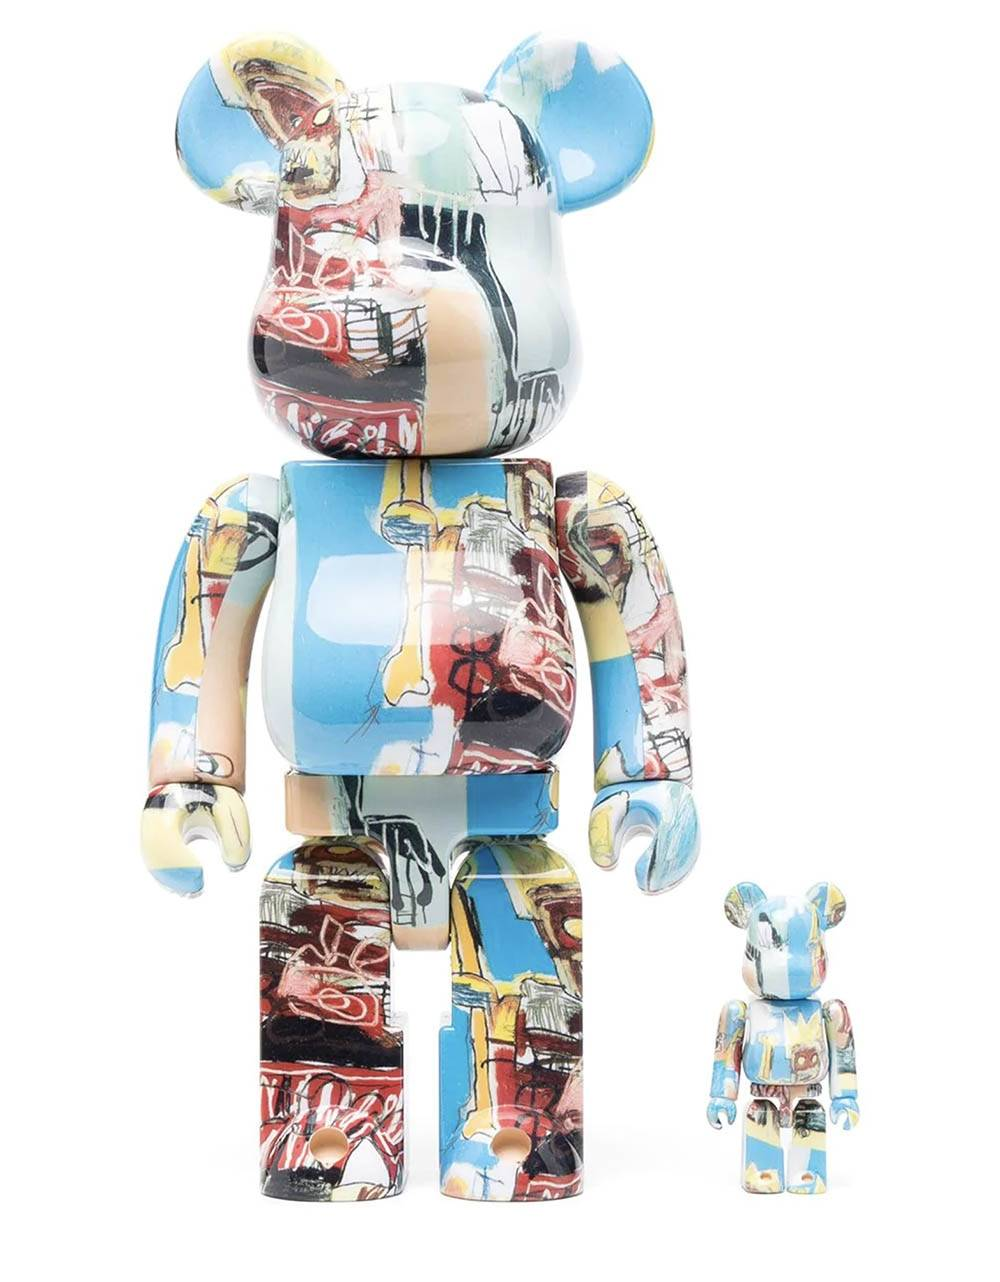 Medicom Toy x Jean Michel Basquiat 6 Bearbrick Set 100% 400% Medicom Toy Toys 204,92€